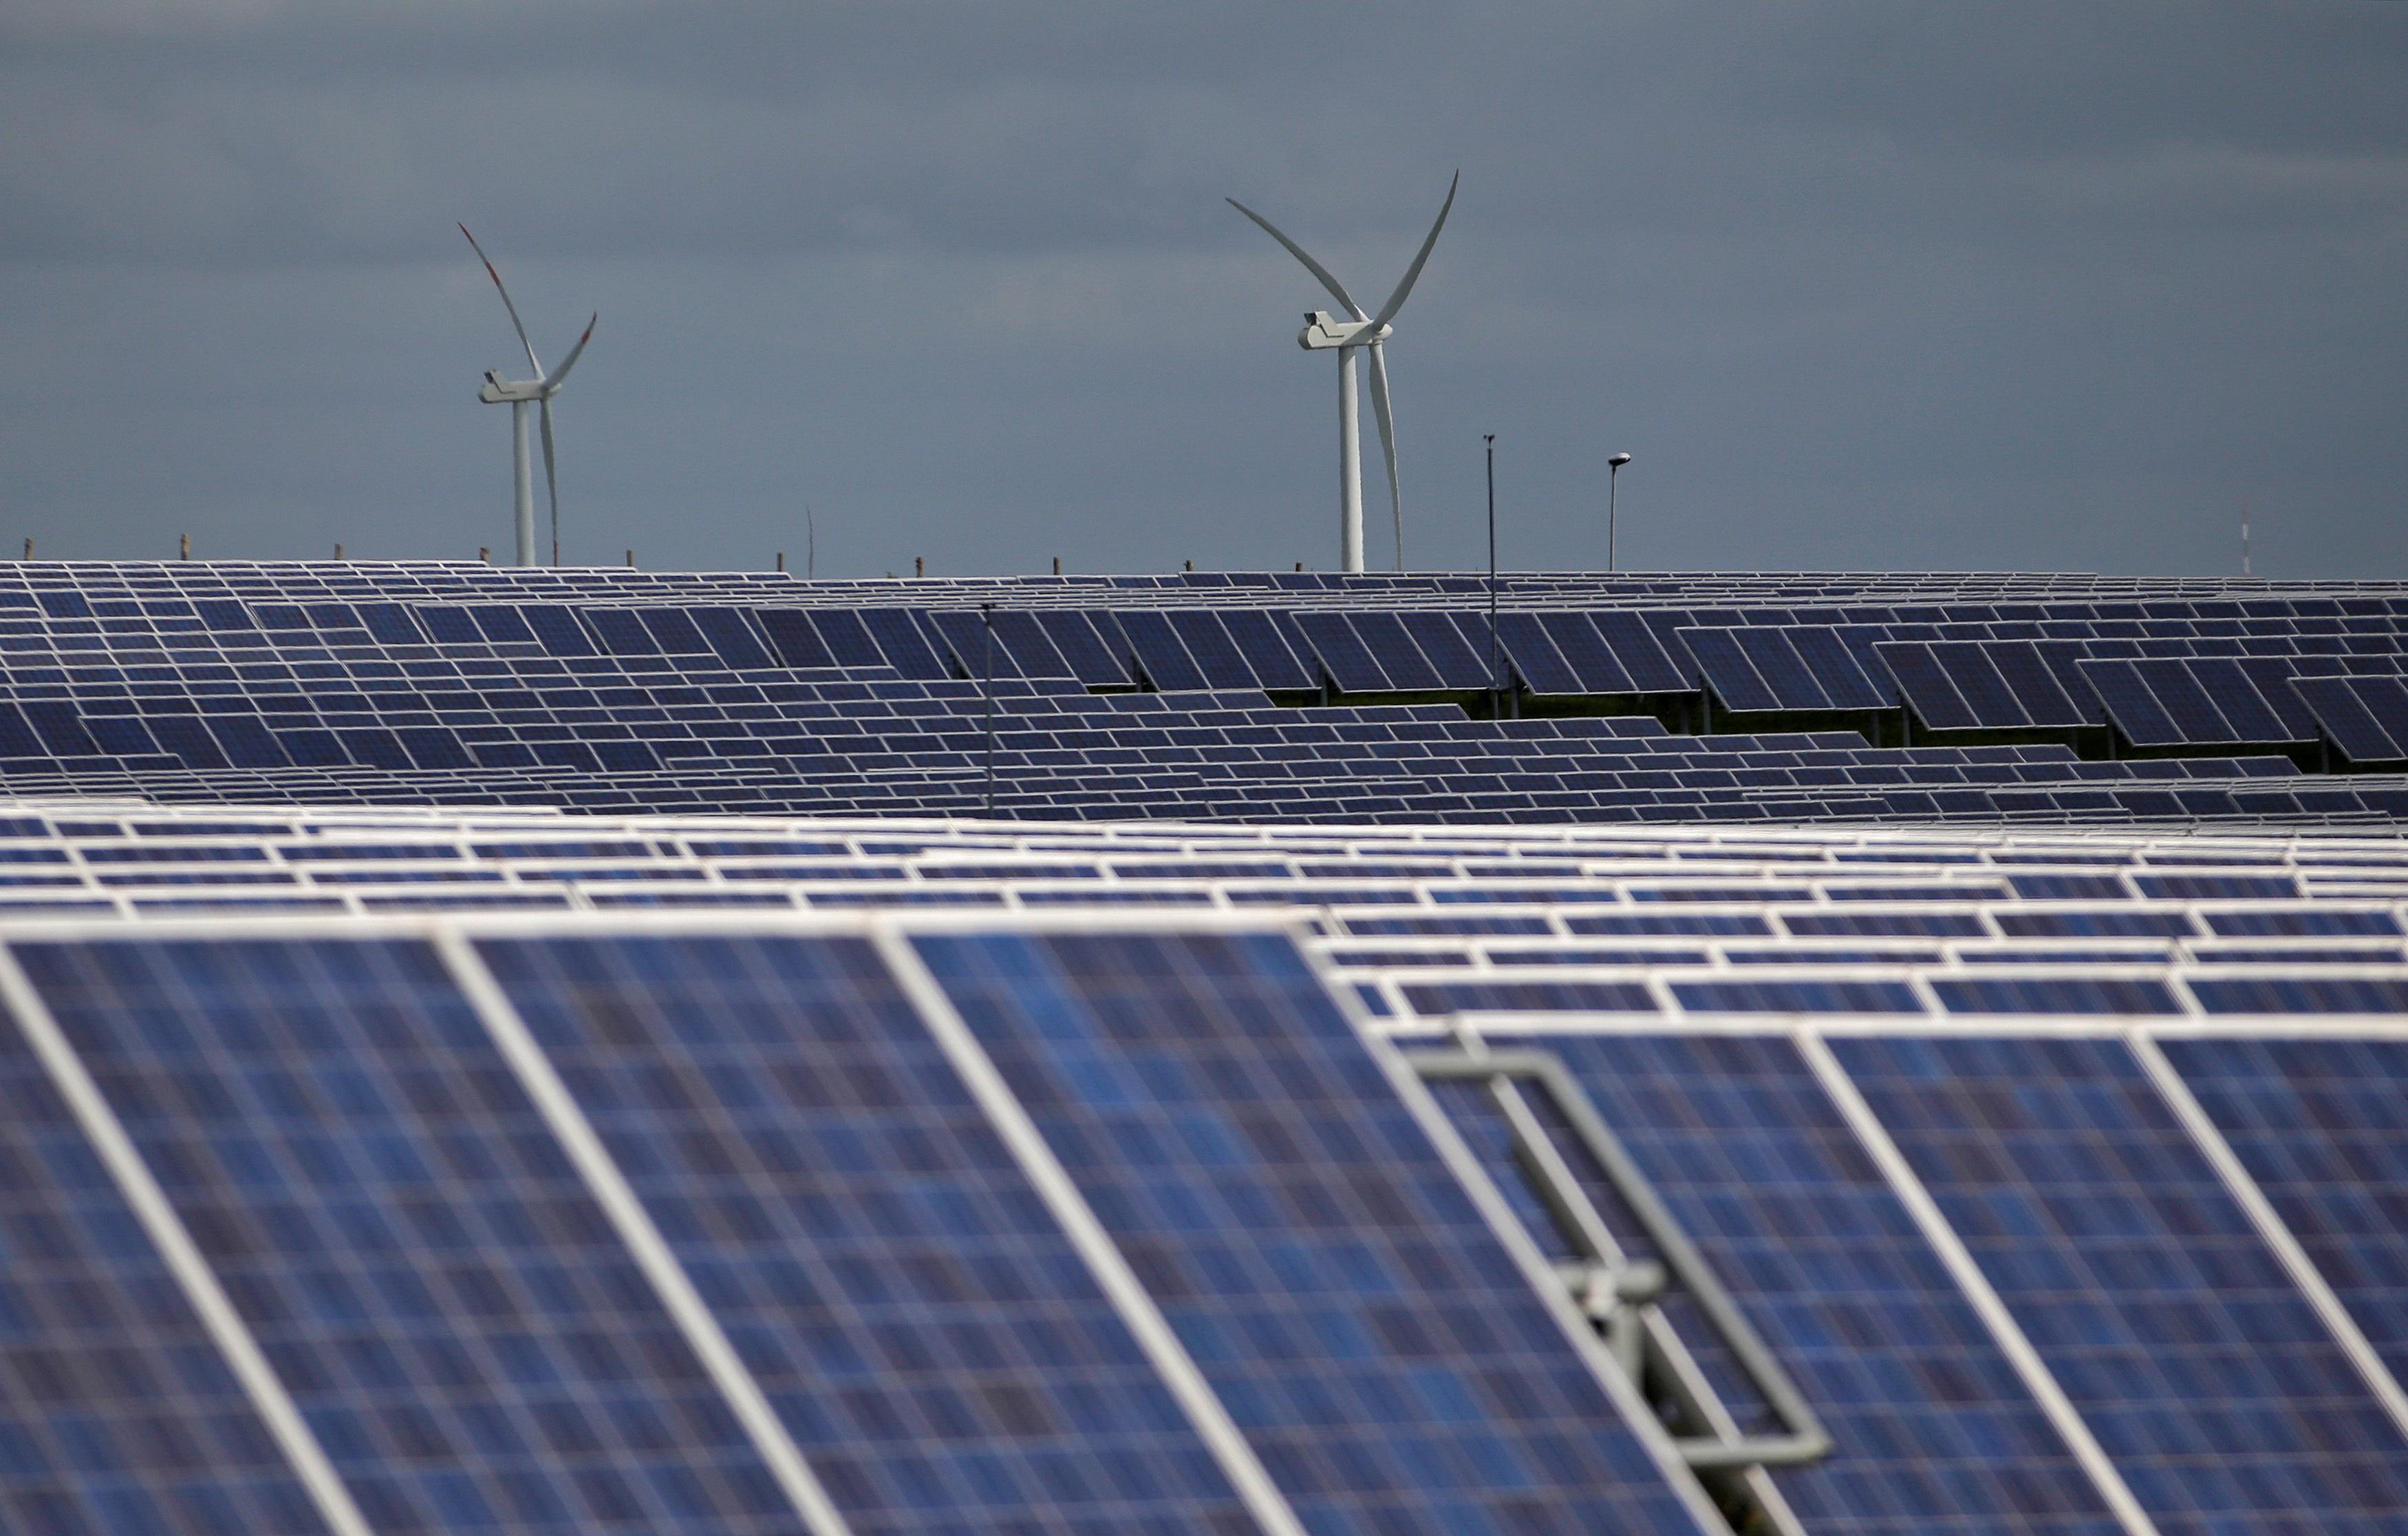 Column: Rising energy use to push CO2 far above target through 2050